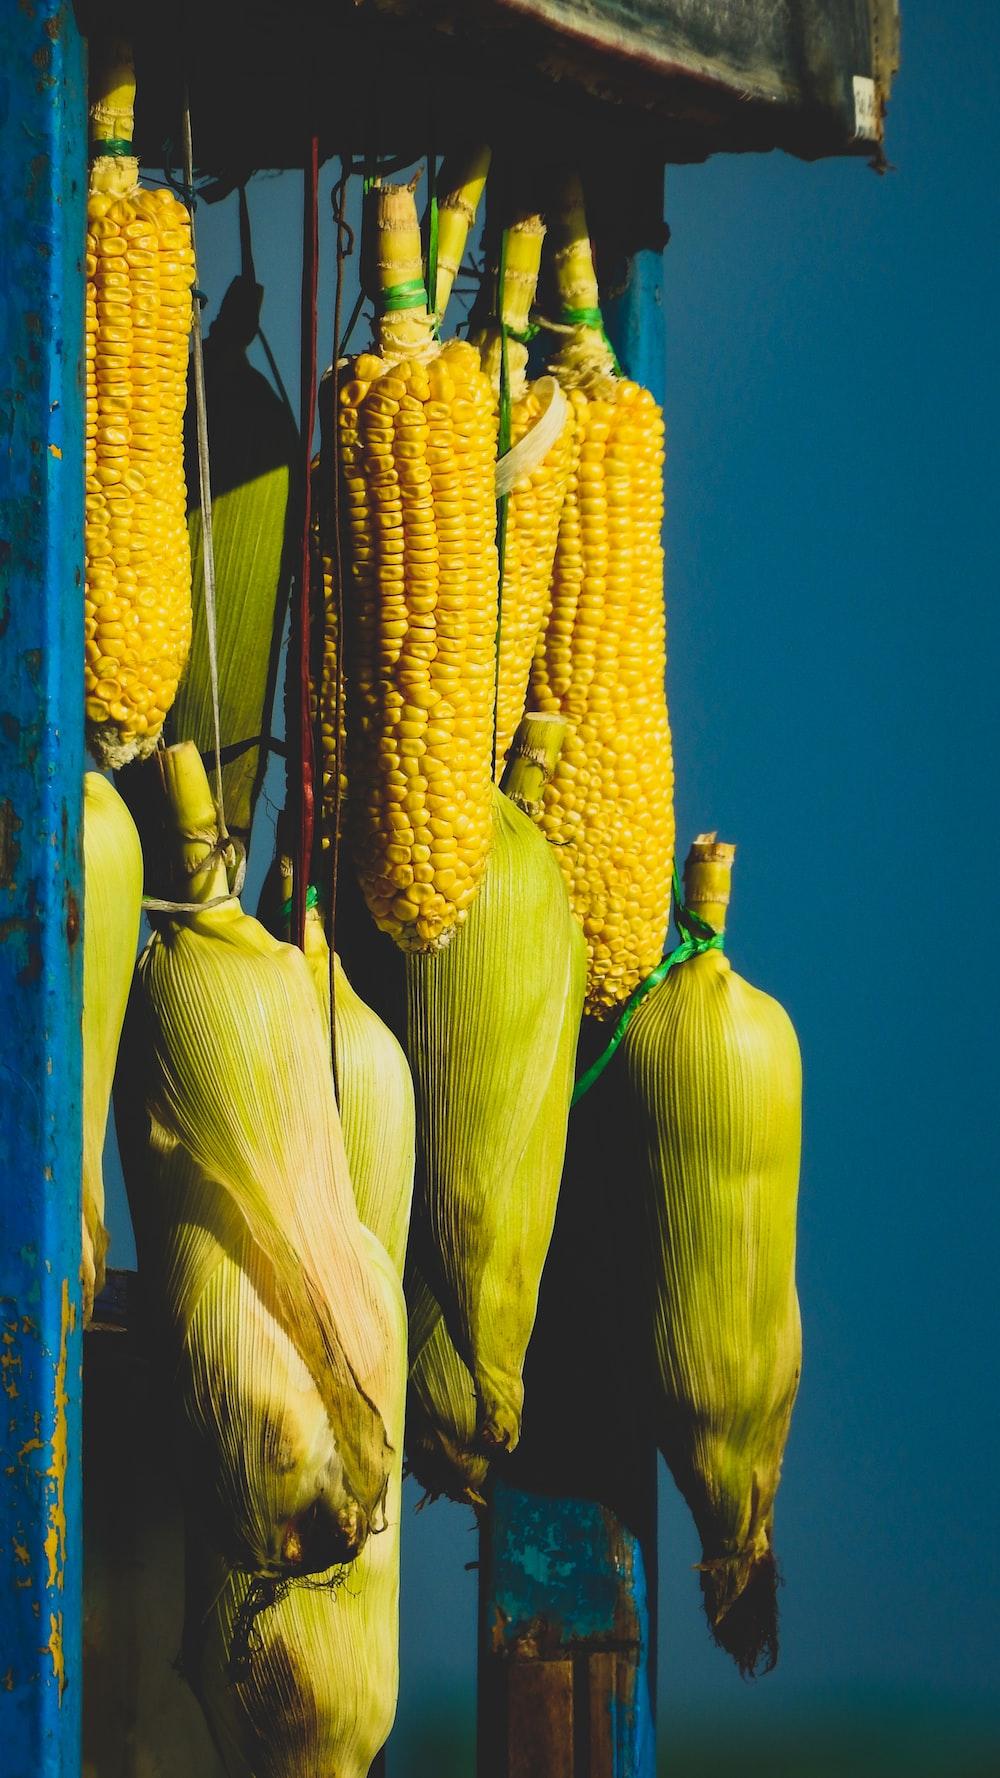 yellow corn on blue background